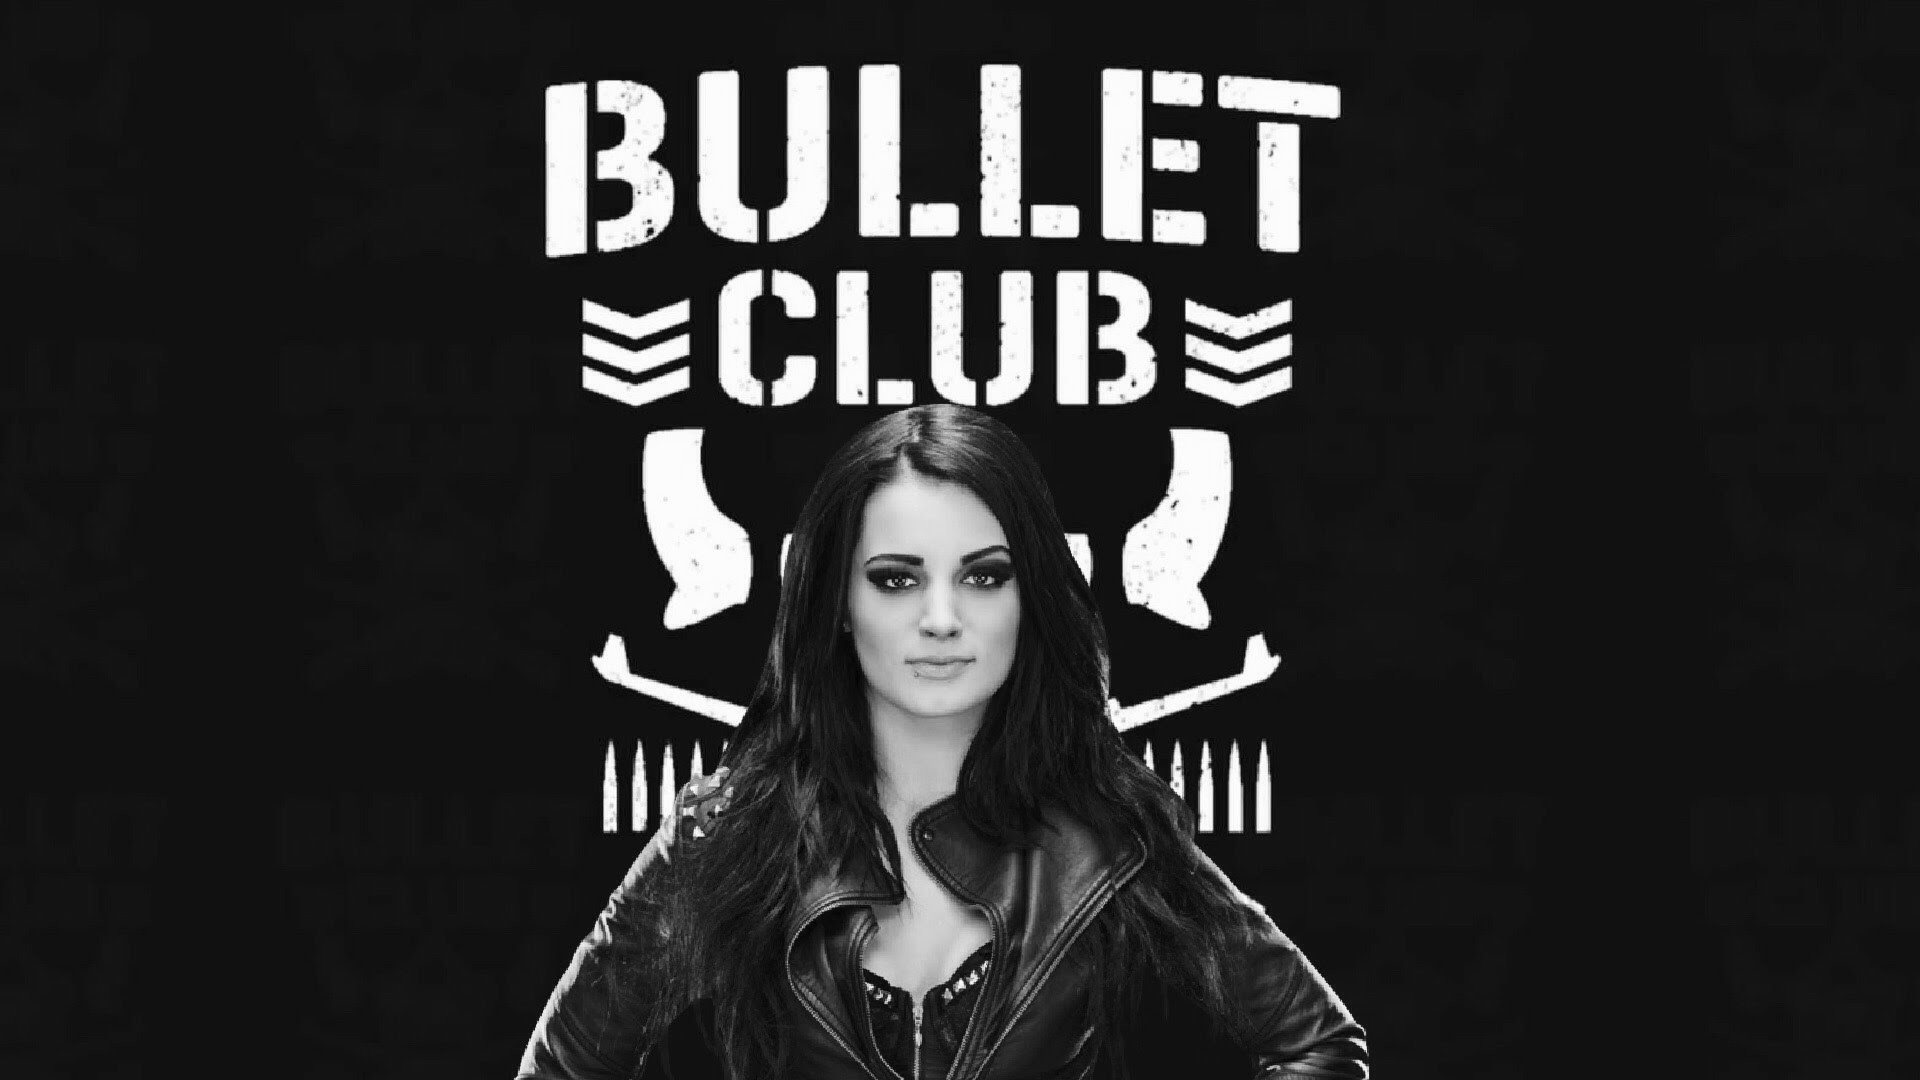 WWE Paige Bullet Club Entrance Video